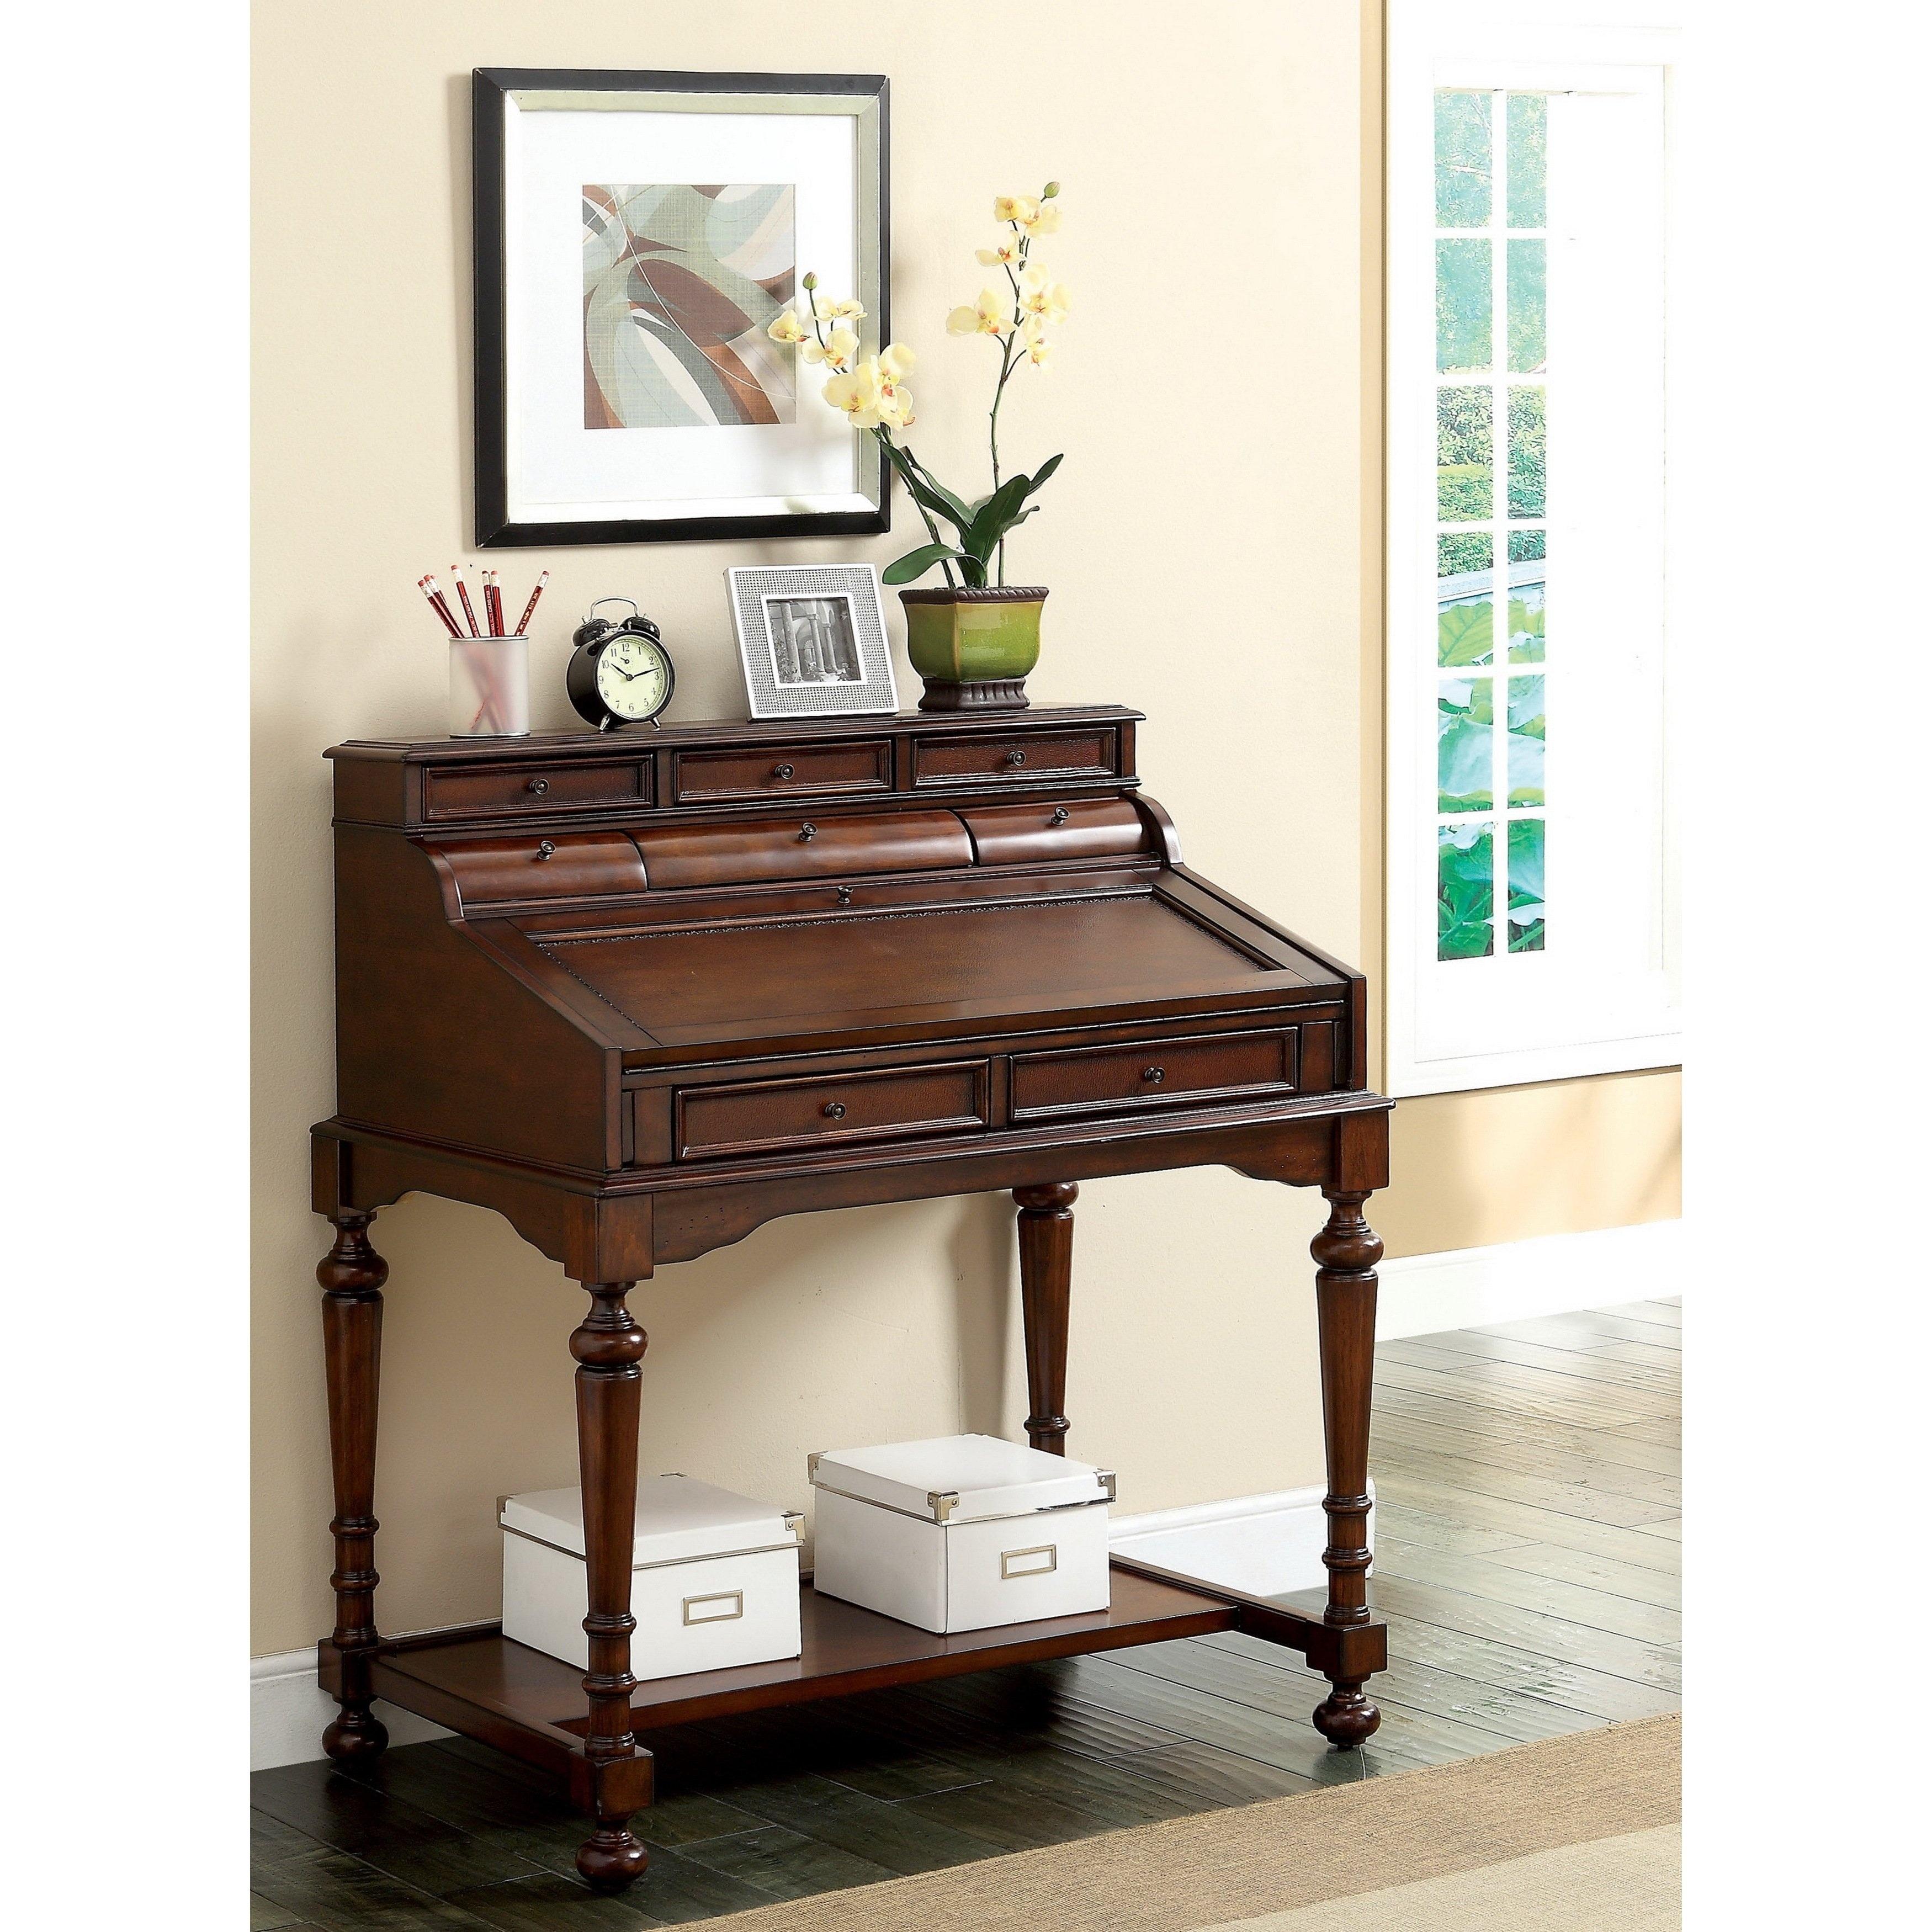 Furniture of America Cantrus Traditional Secretary Writin...